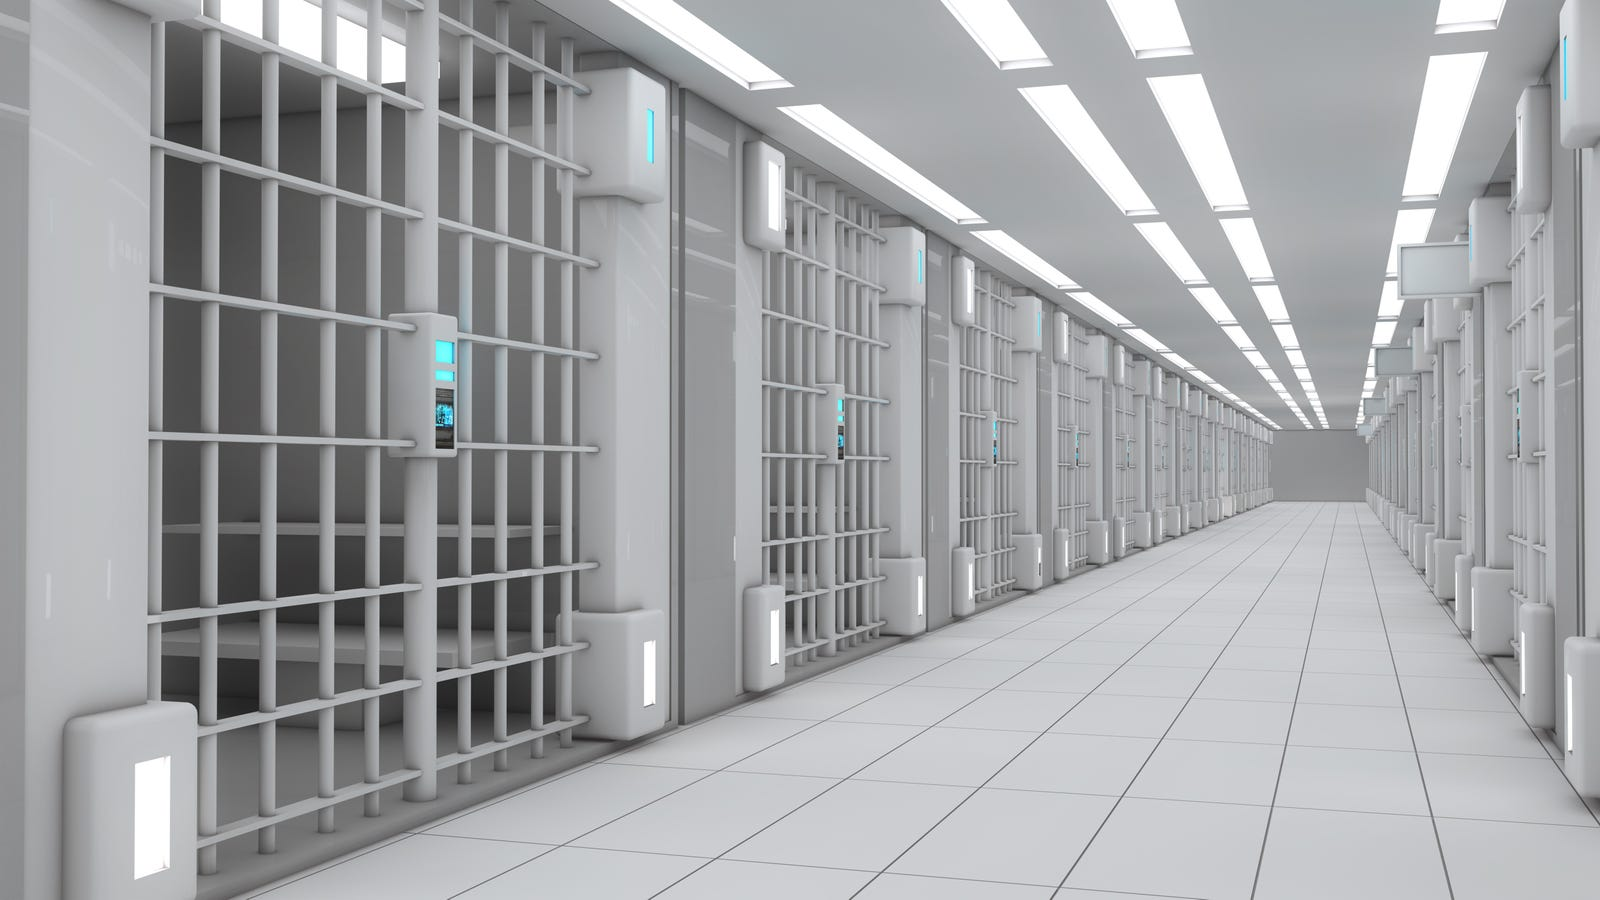 Former Ohio Inmate Files Lawsuit Alleging She Was Refused